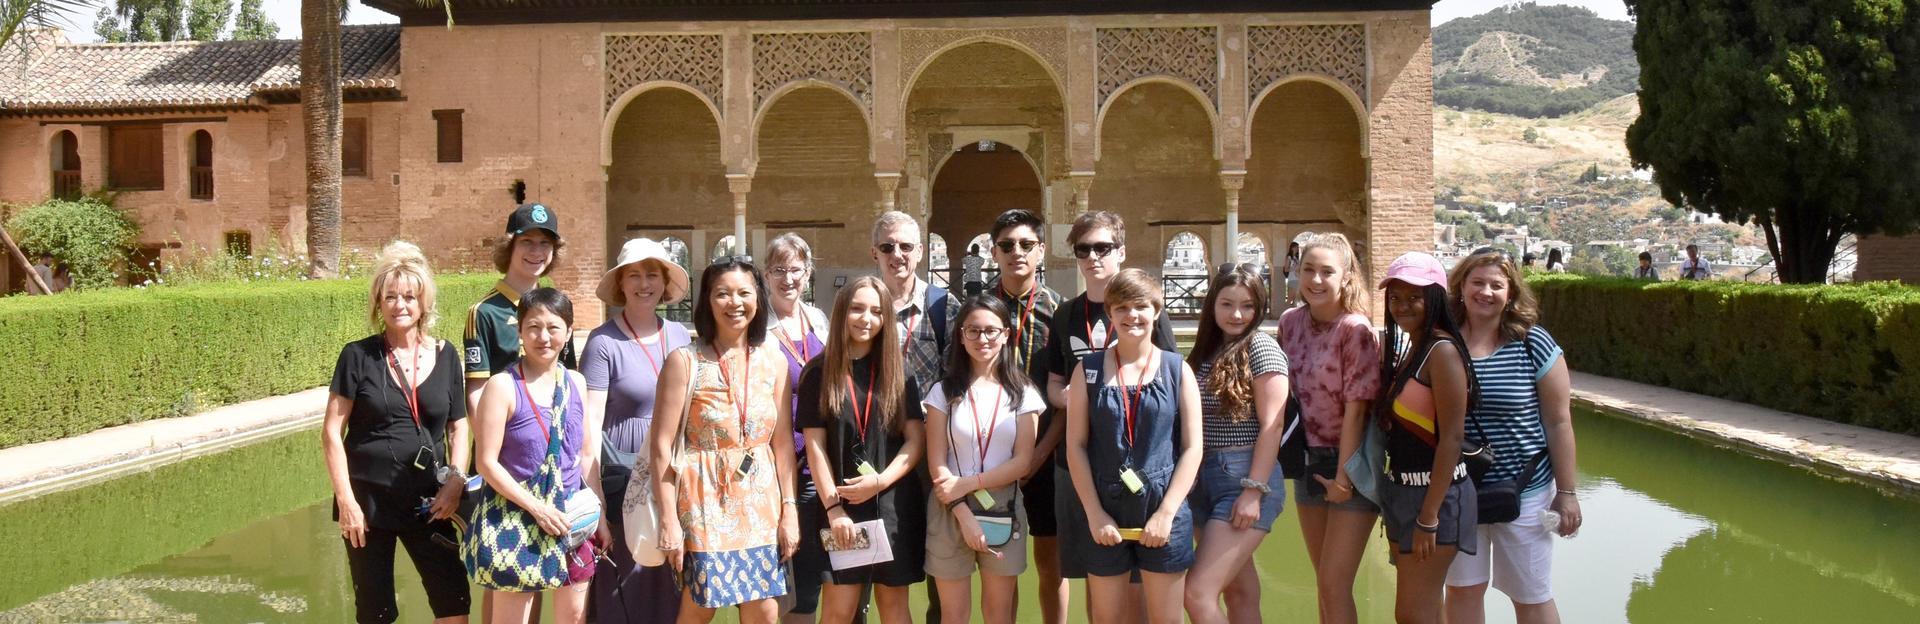 PCS group at Alhambra, Granada, Spain 2018